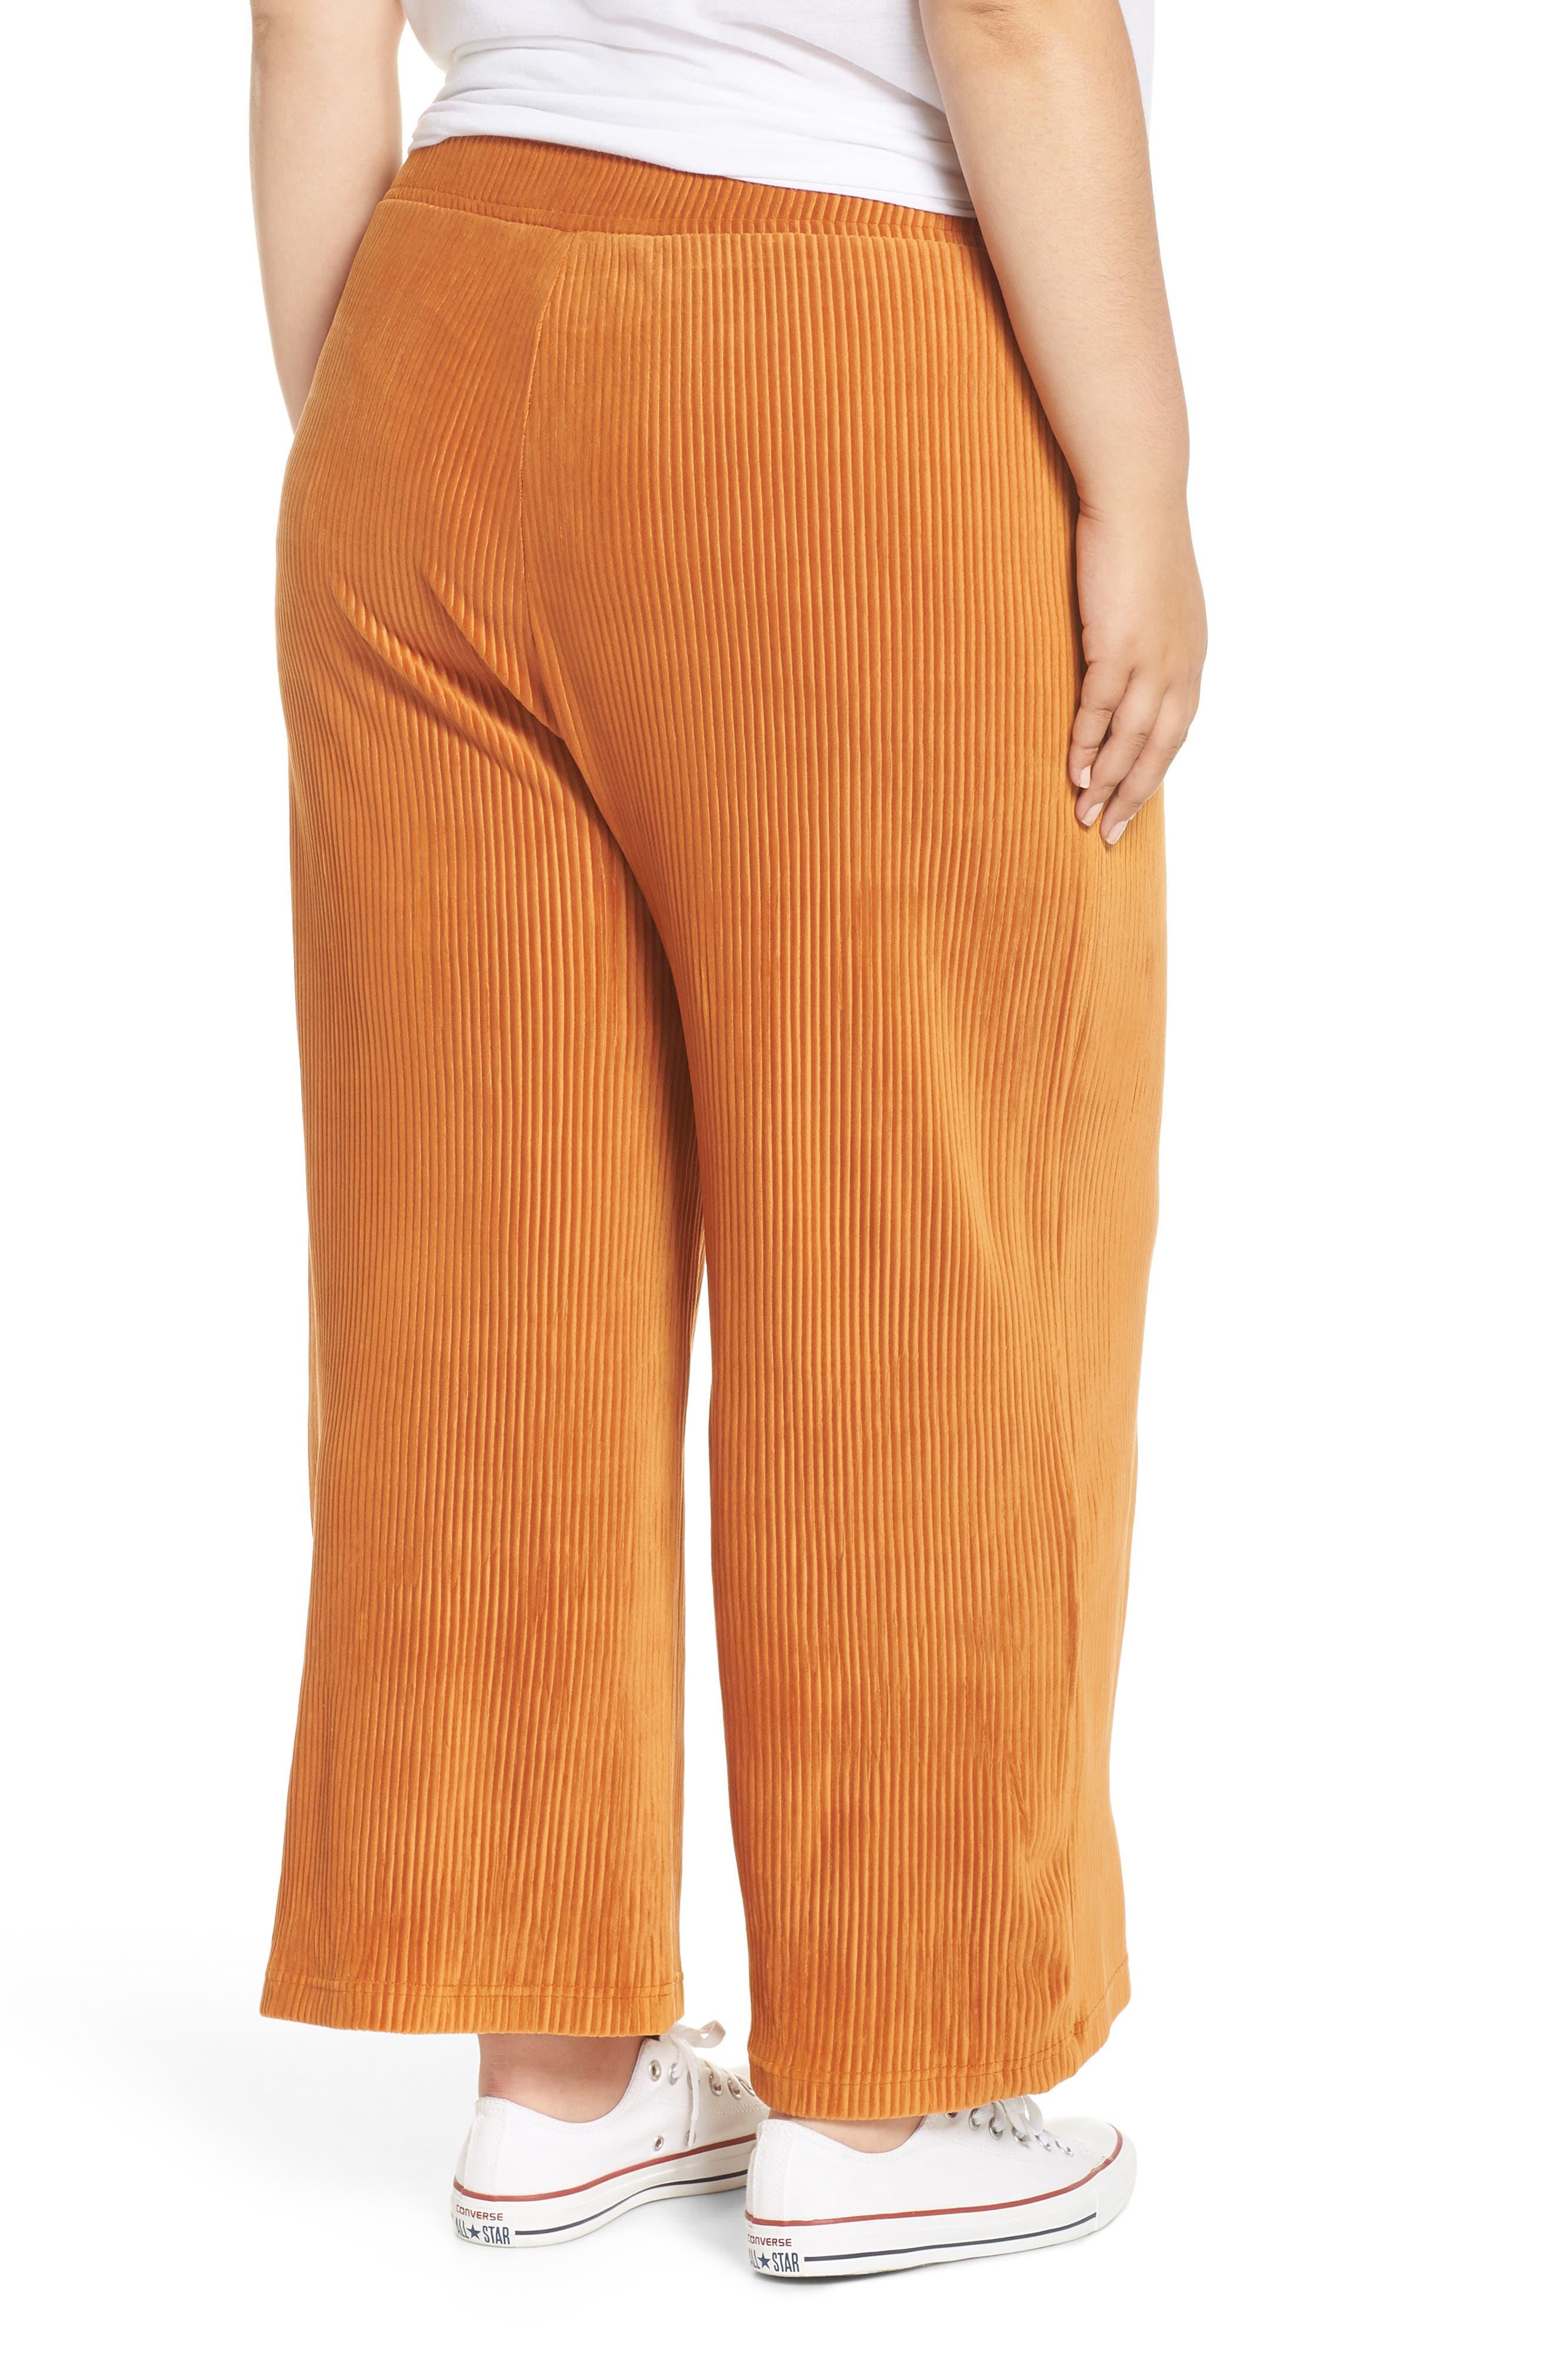 High Rise Knit Corduroy Crop Pants,                             Alternate thumbnail 9, color,                             RUST CIDER